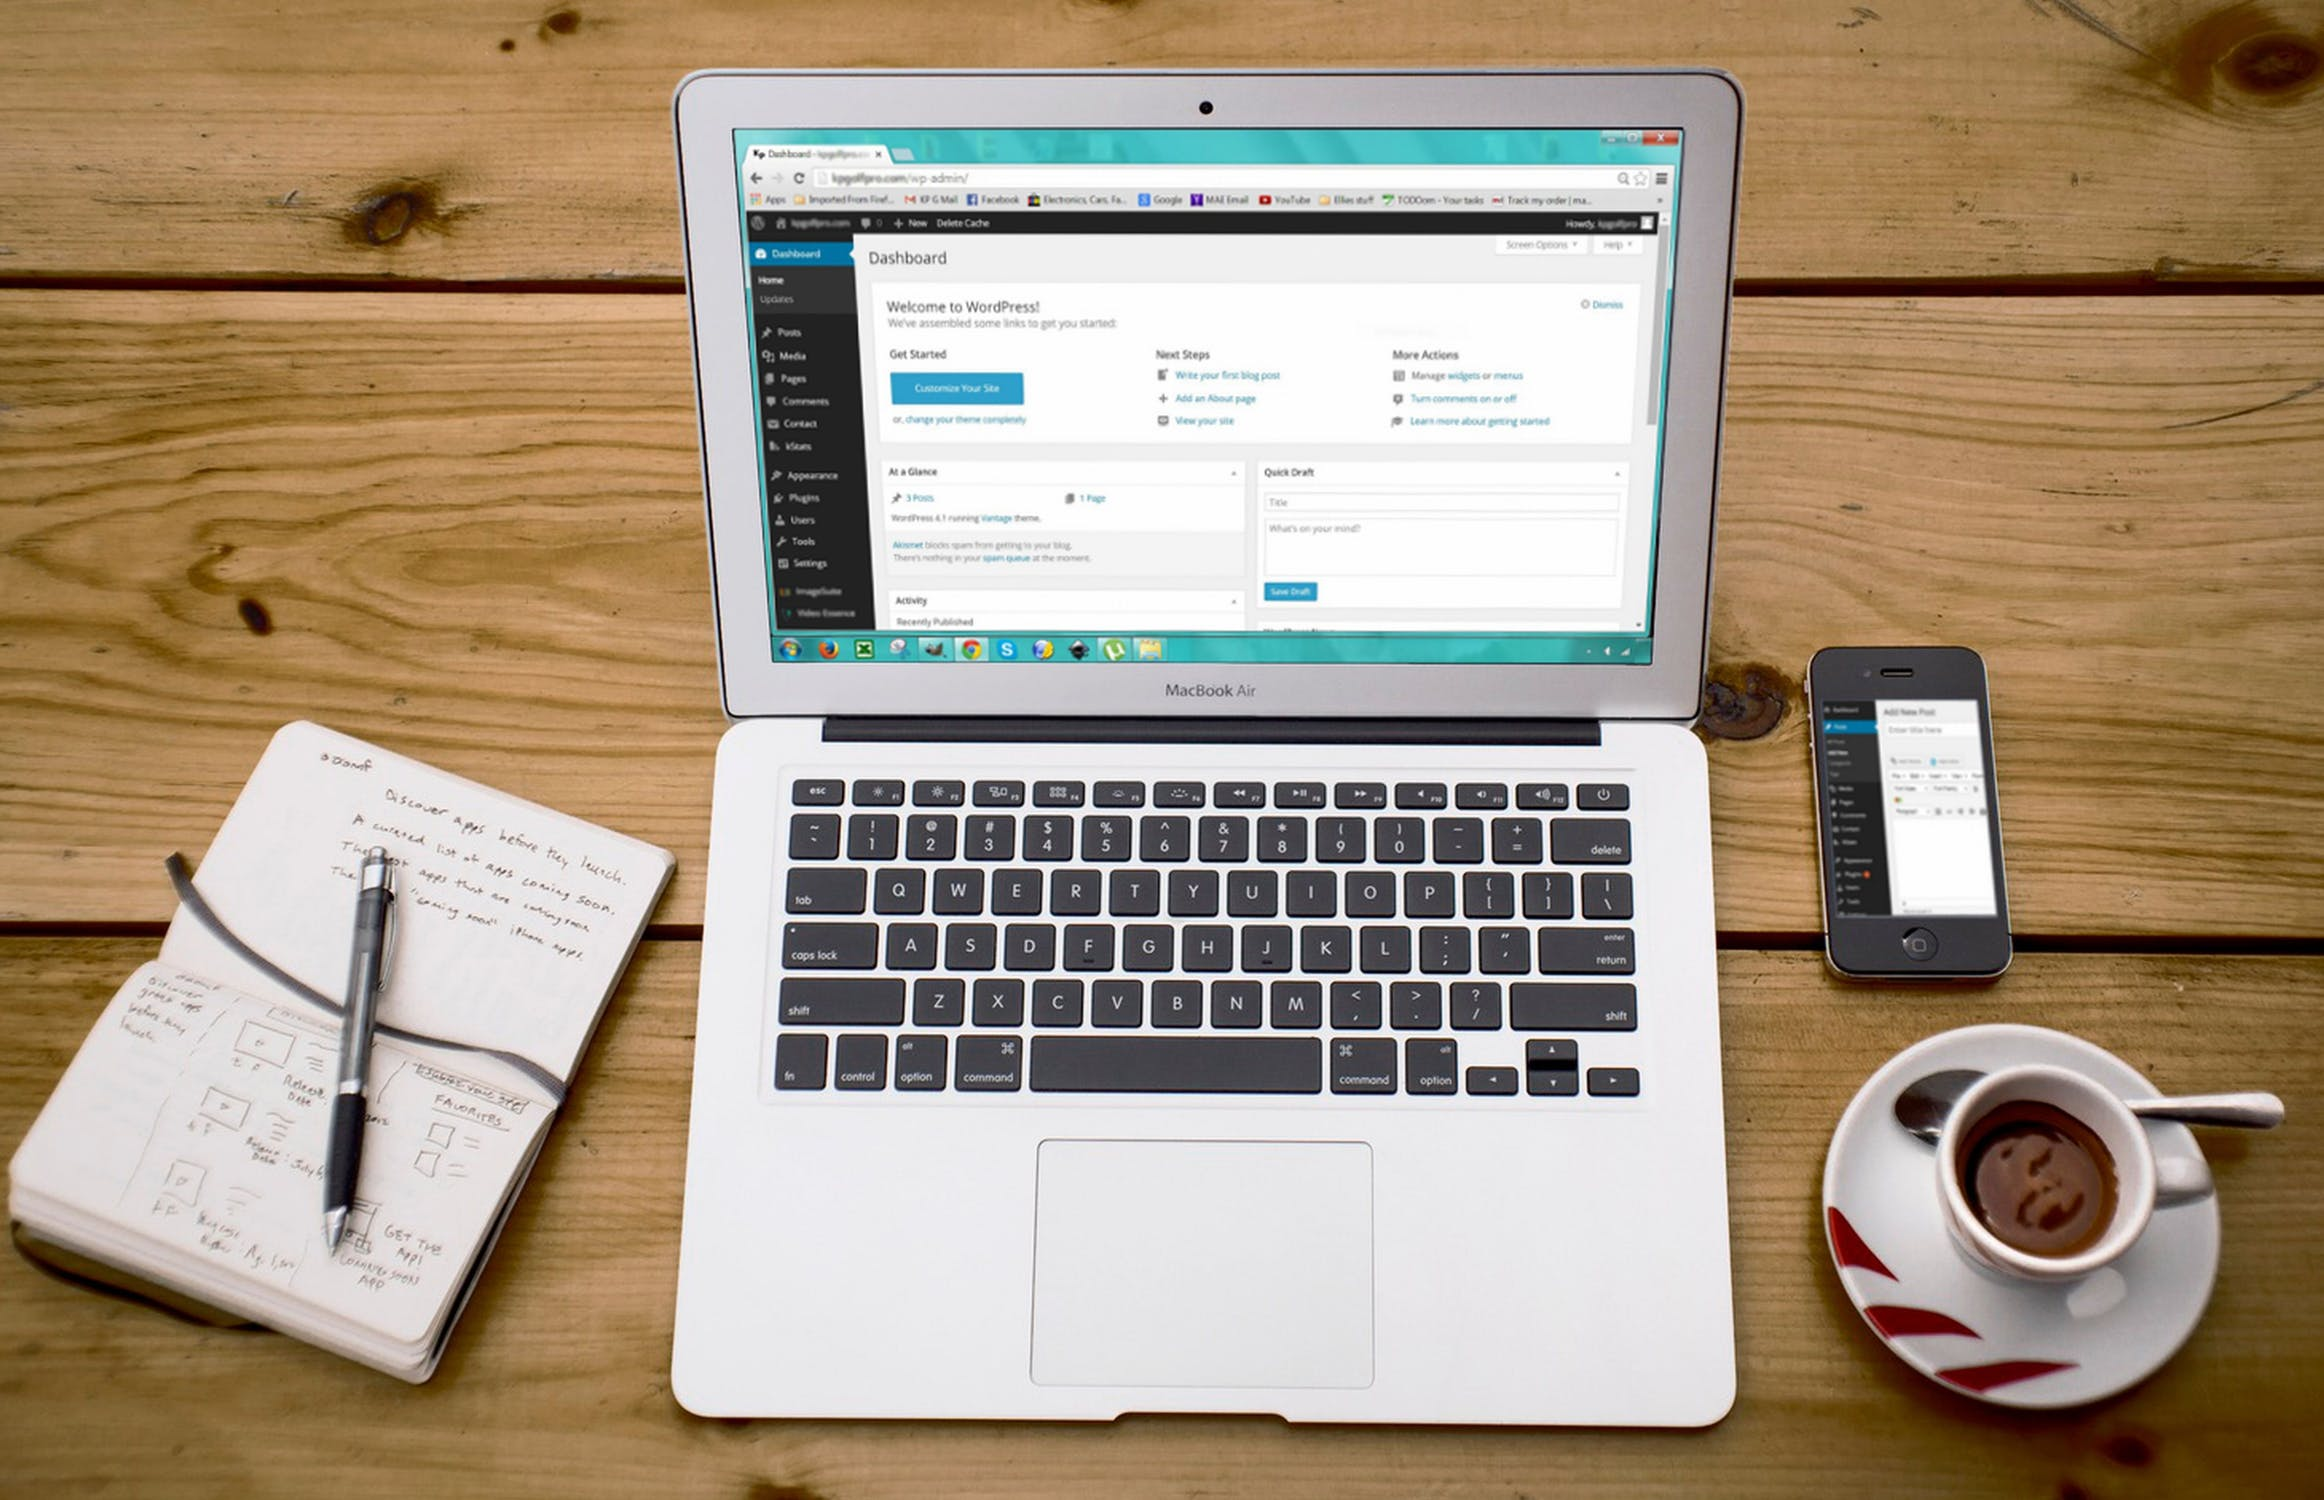 The Top 7 Tips For Simpler WordPress Web Development